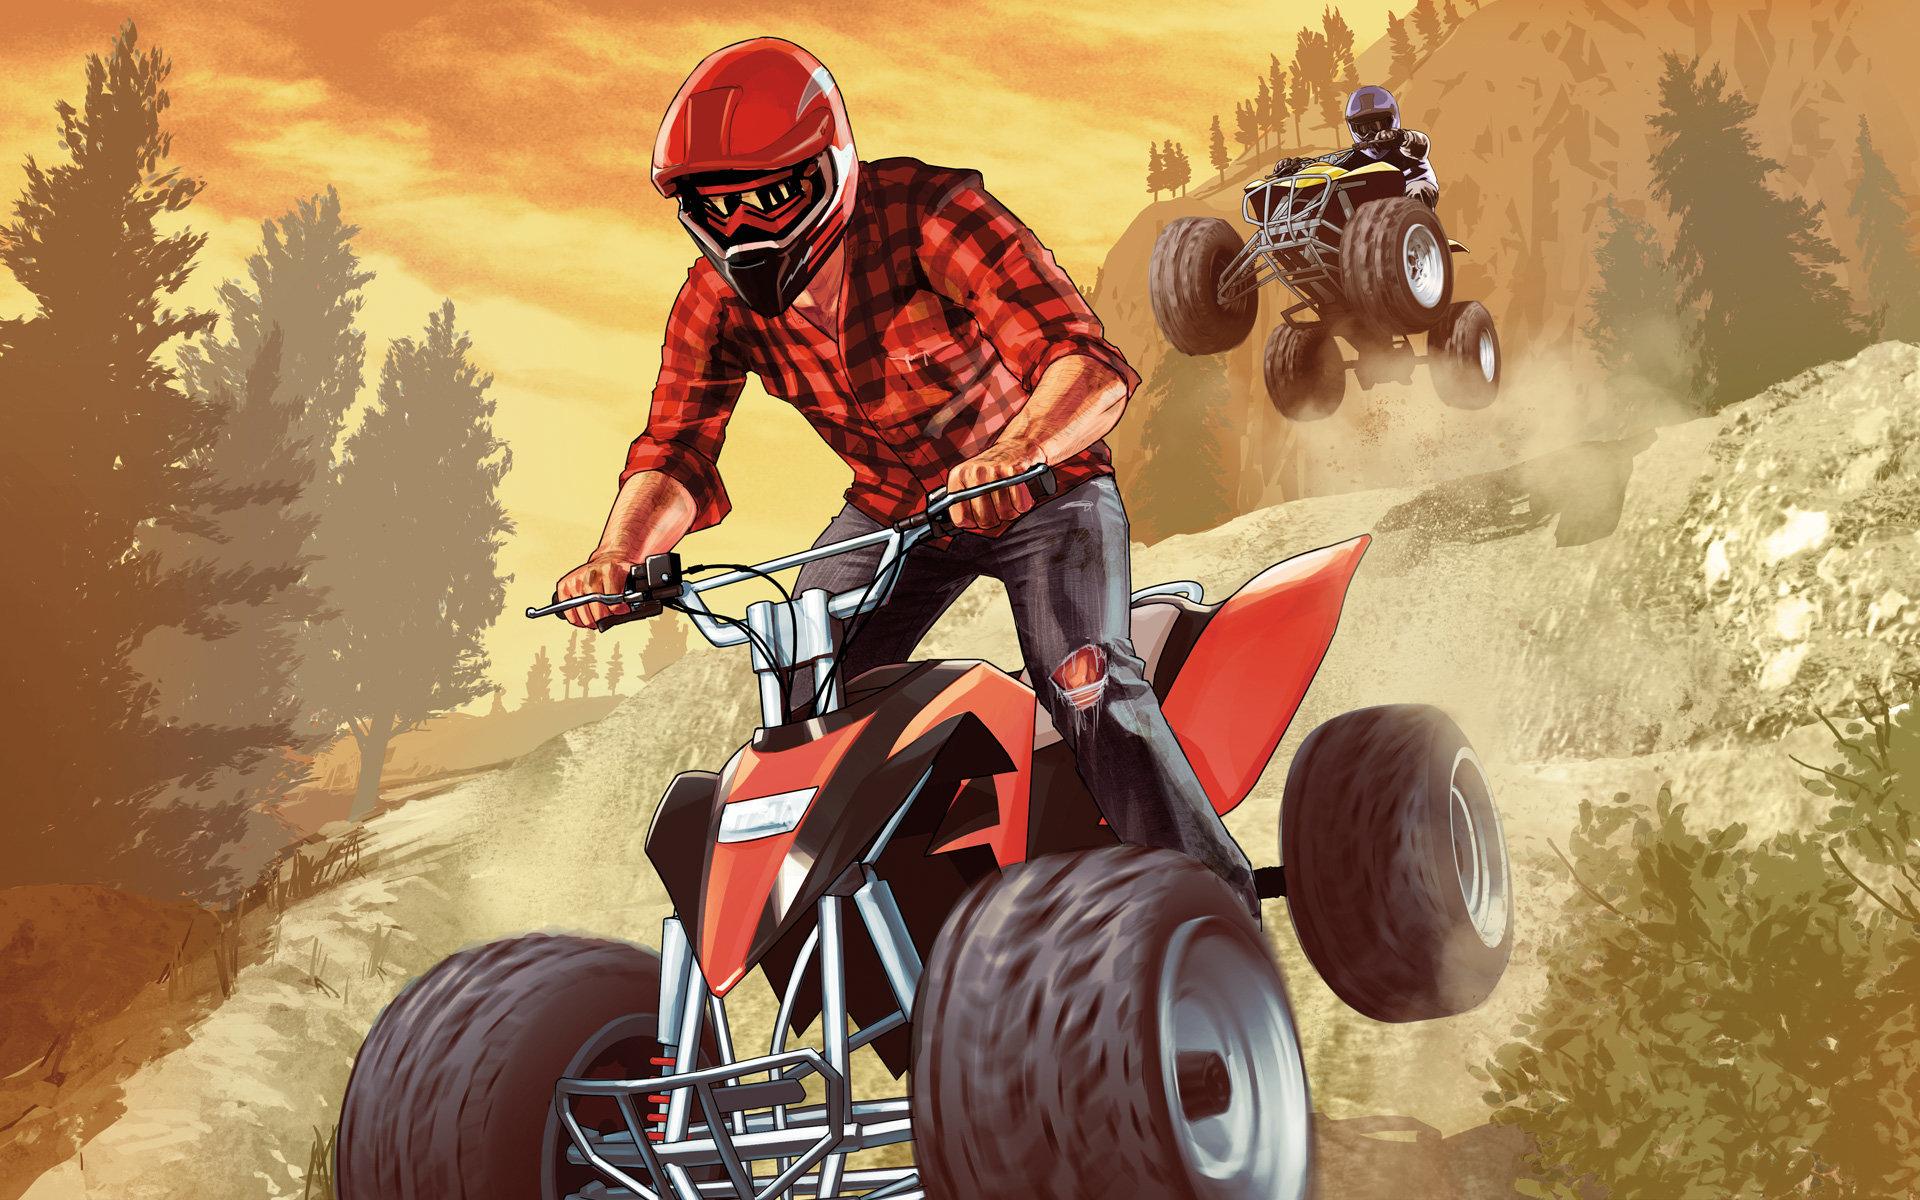 High resolution Grand Theft Auto V (GTA 5) hd 1920x1200 wallpaper ID:195016 for PC